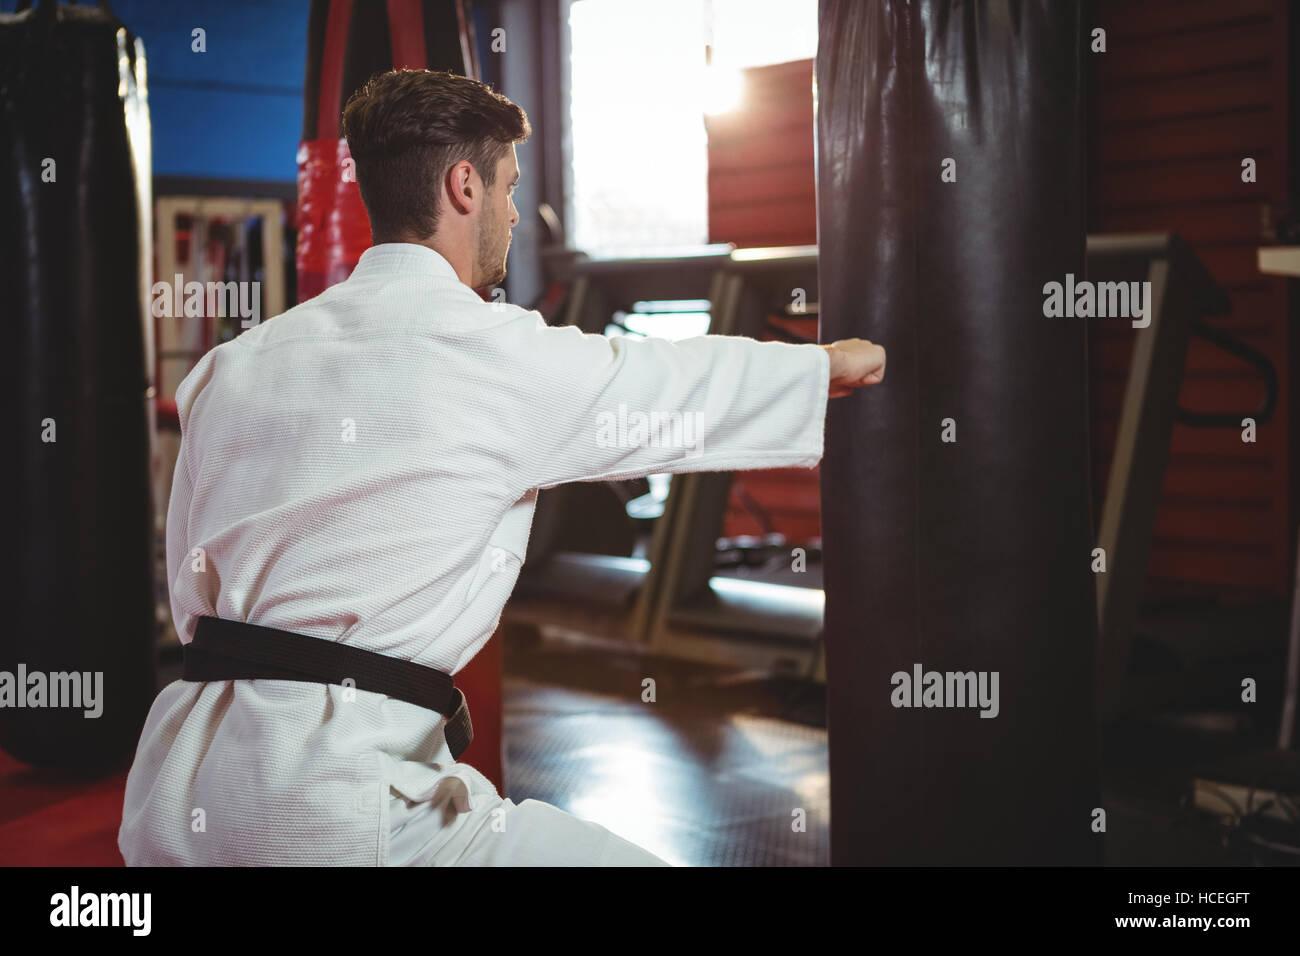 Karate player punching a boxing bag - Stock Image